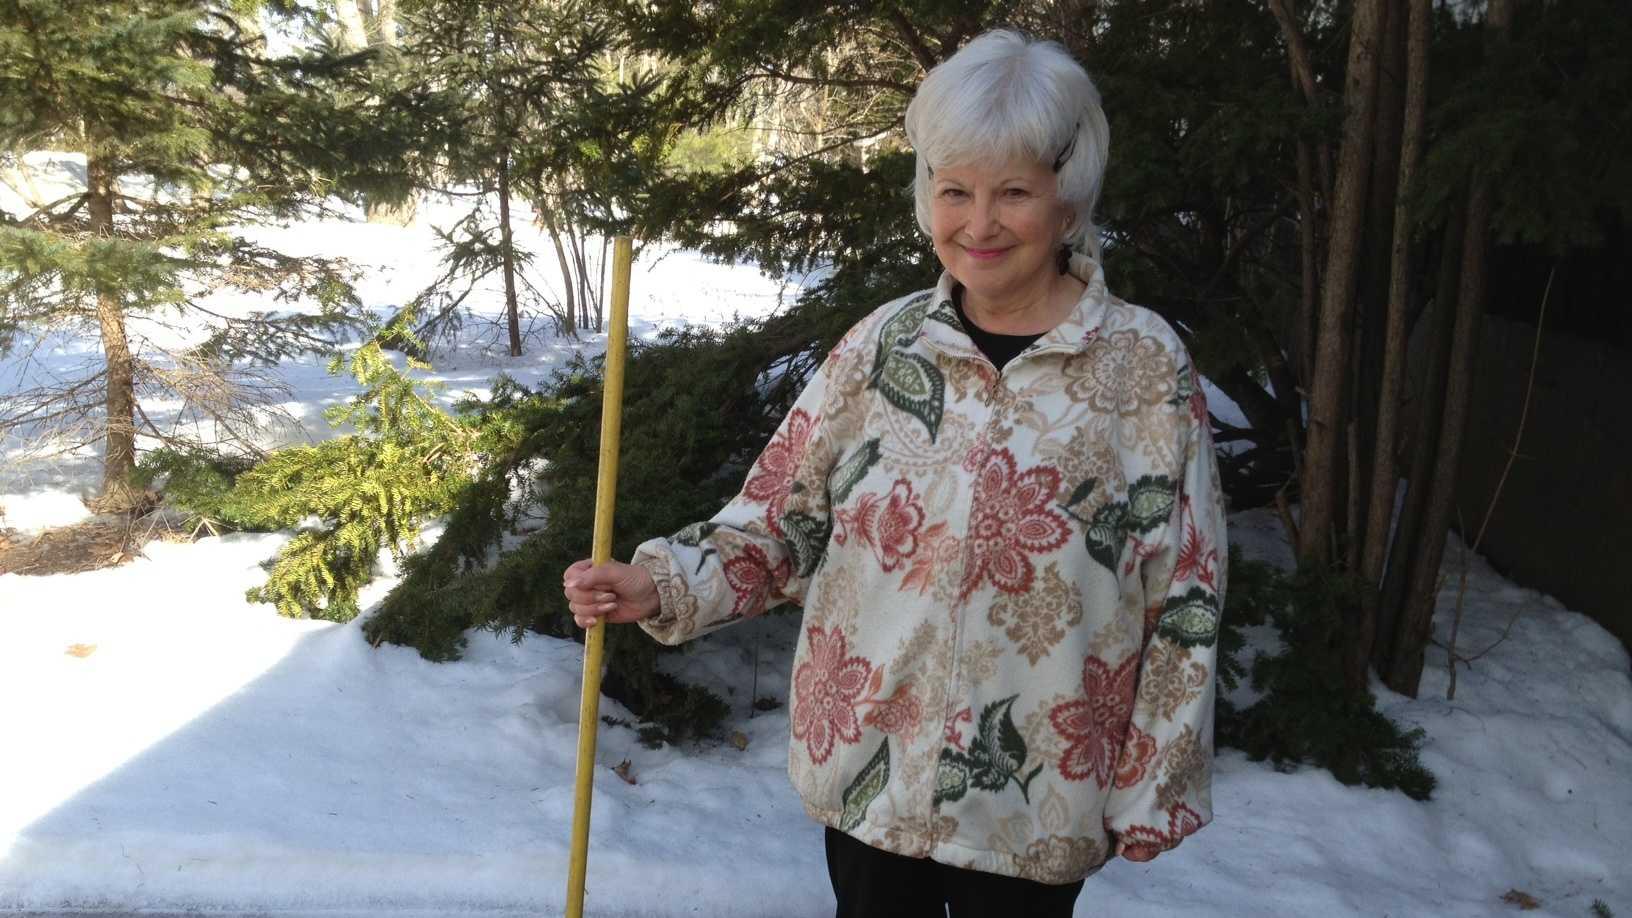 Katherine Reader with broom